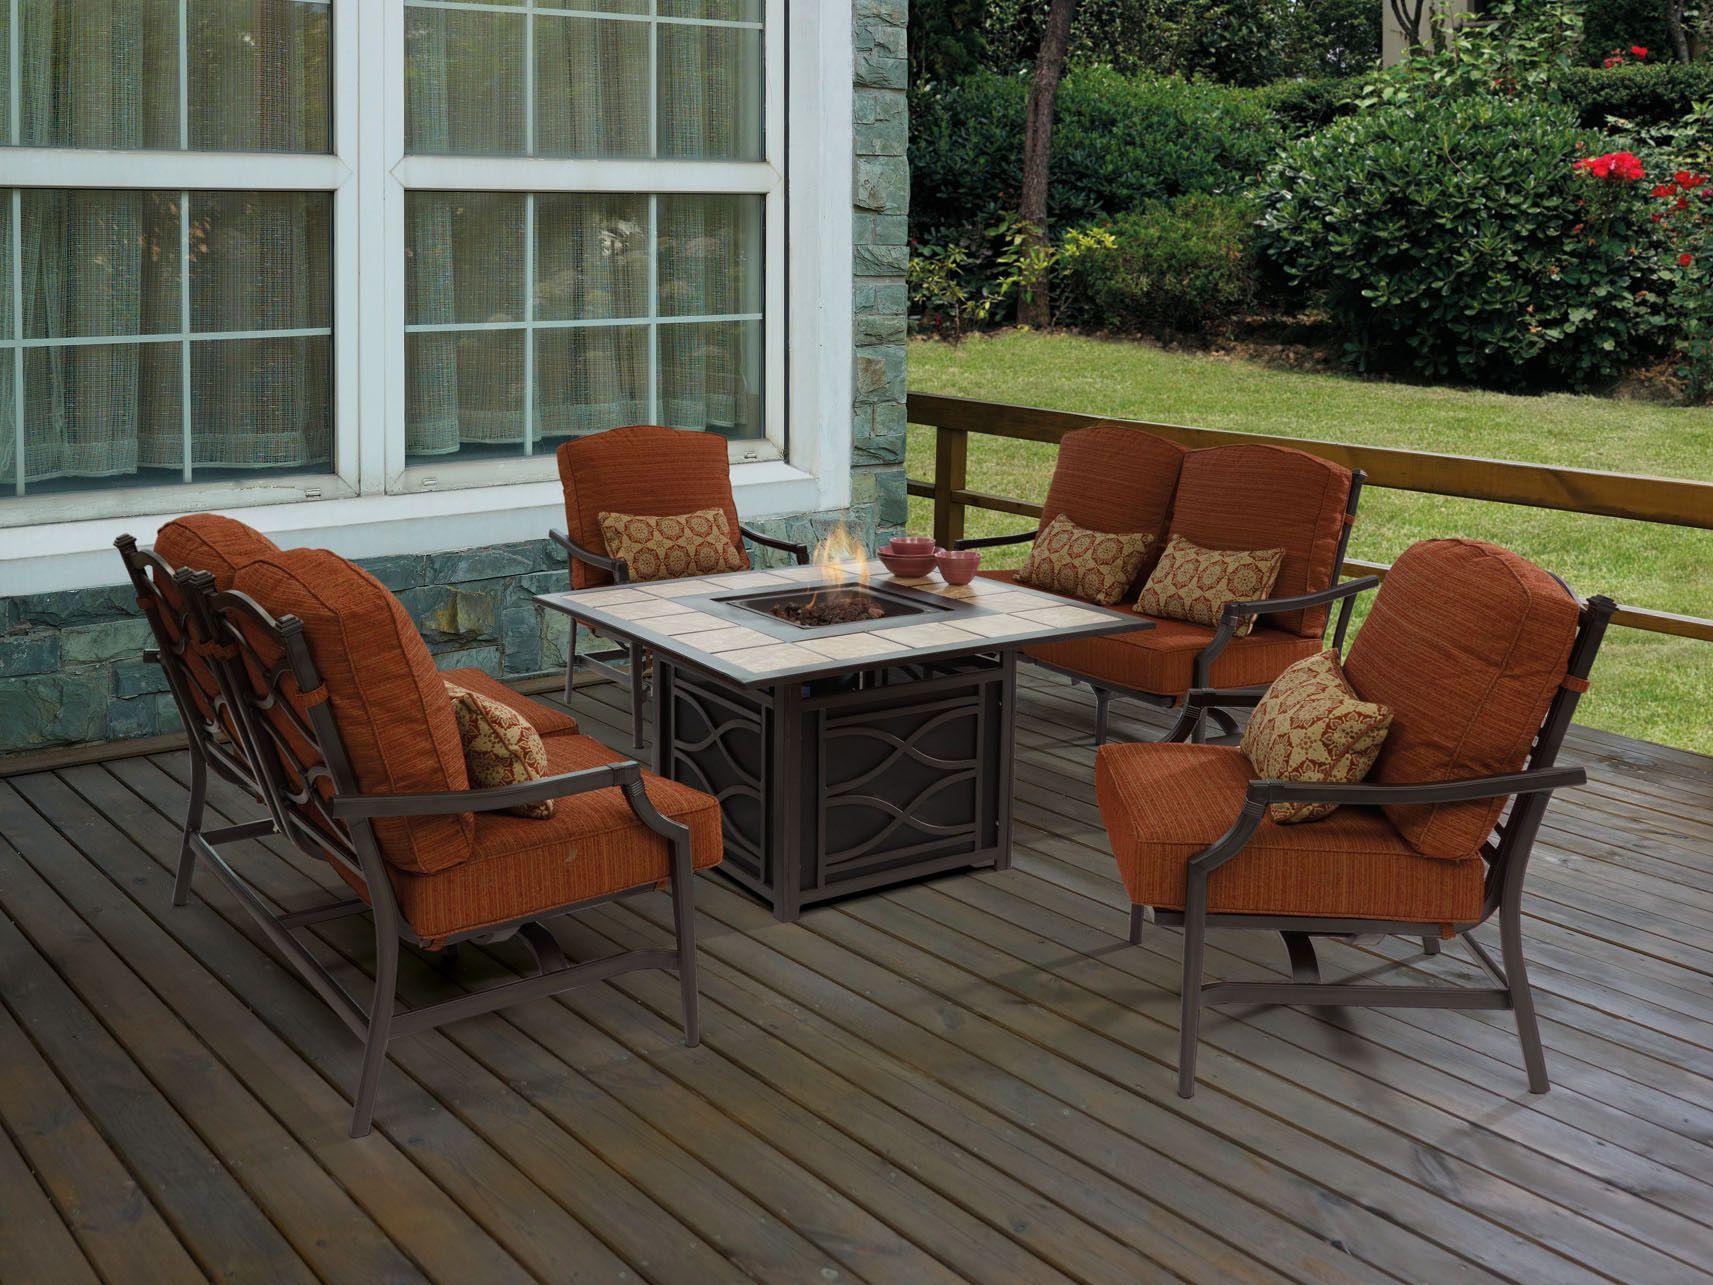 Palisades | Backyard furniture, Outdoor furniture sets ...